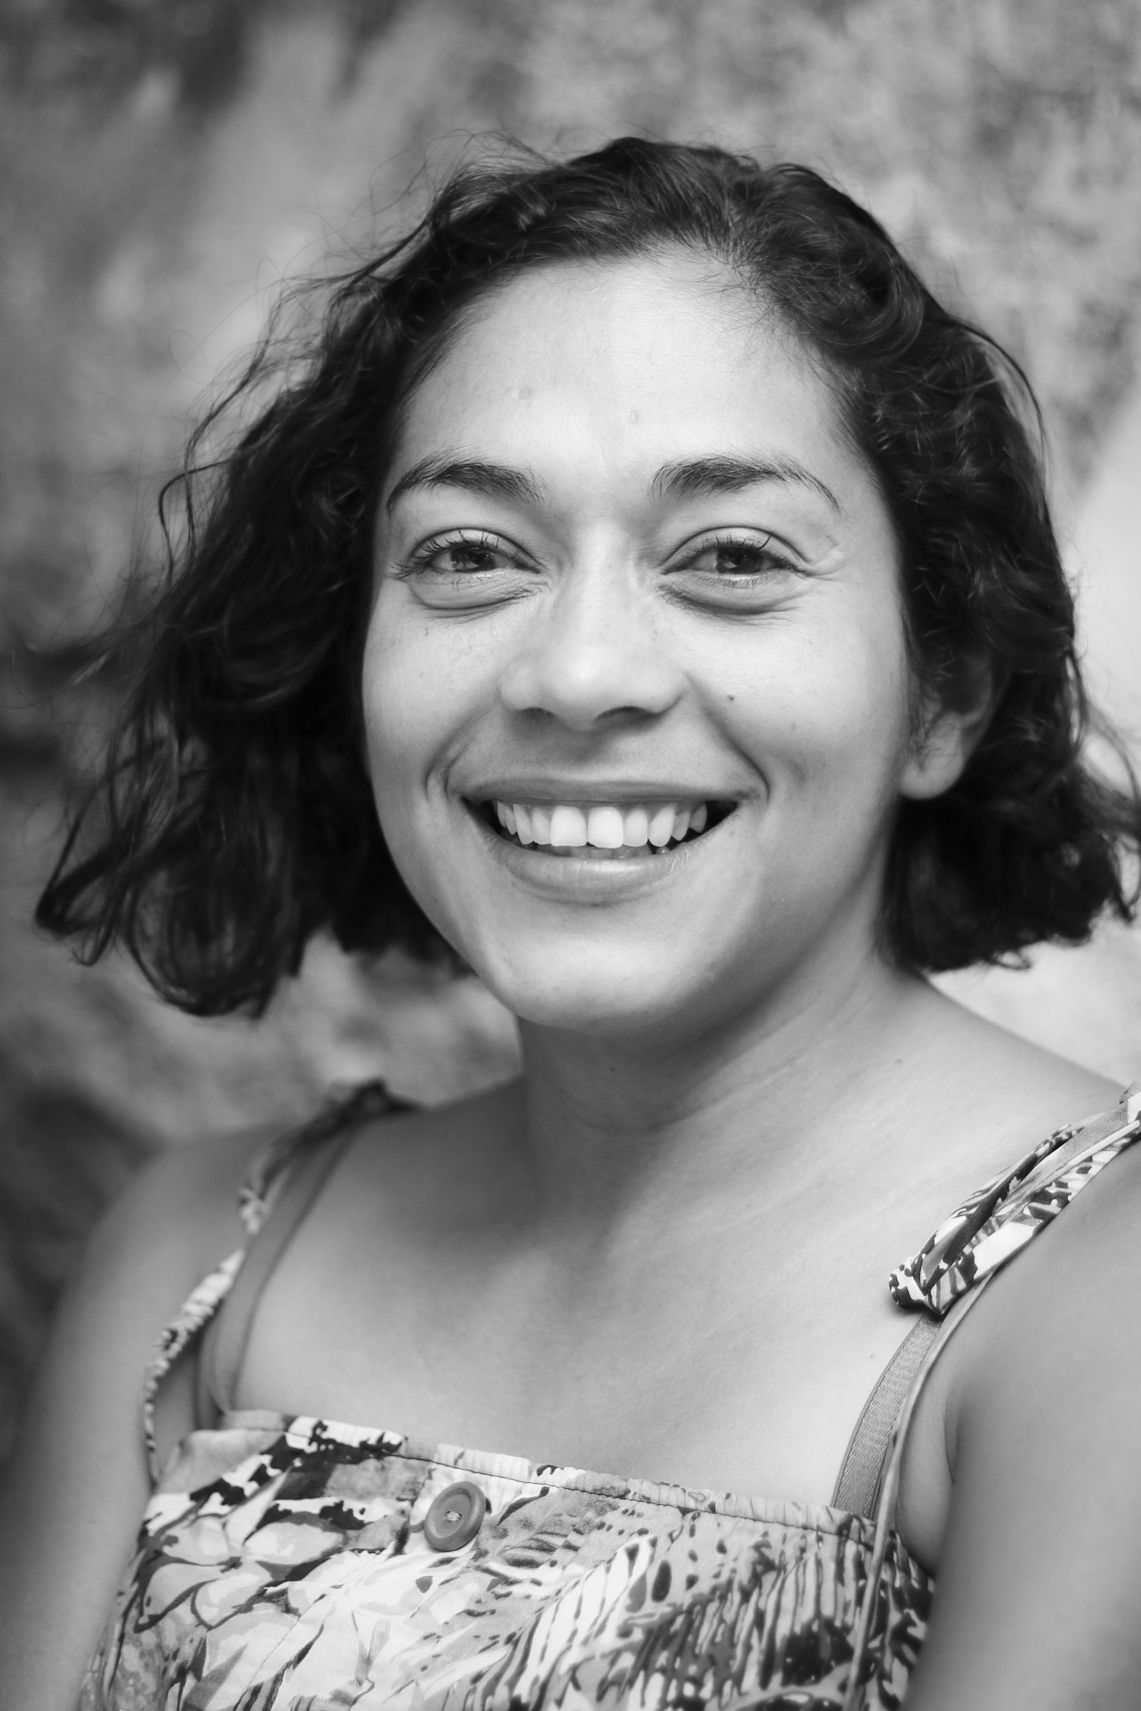 Samantha Páez